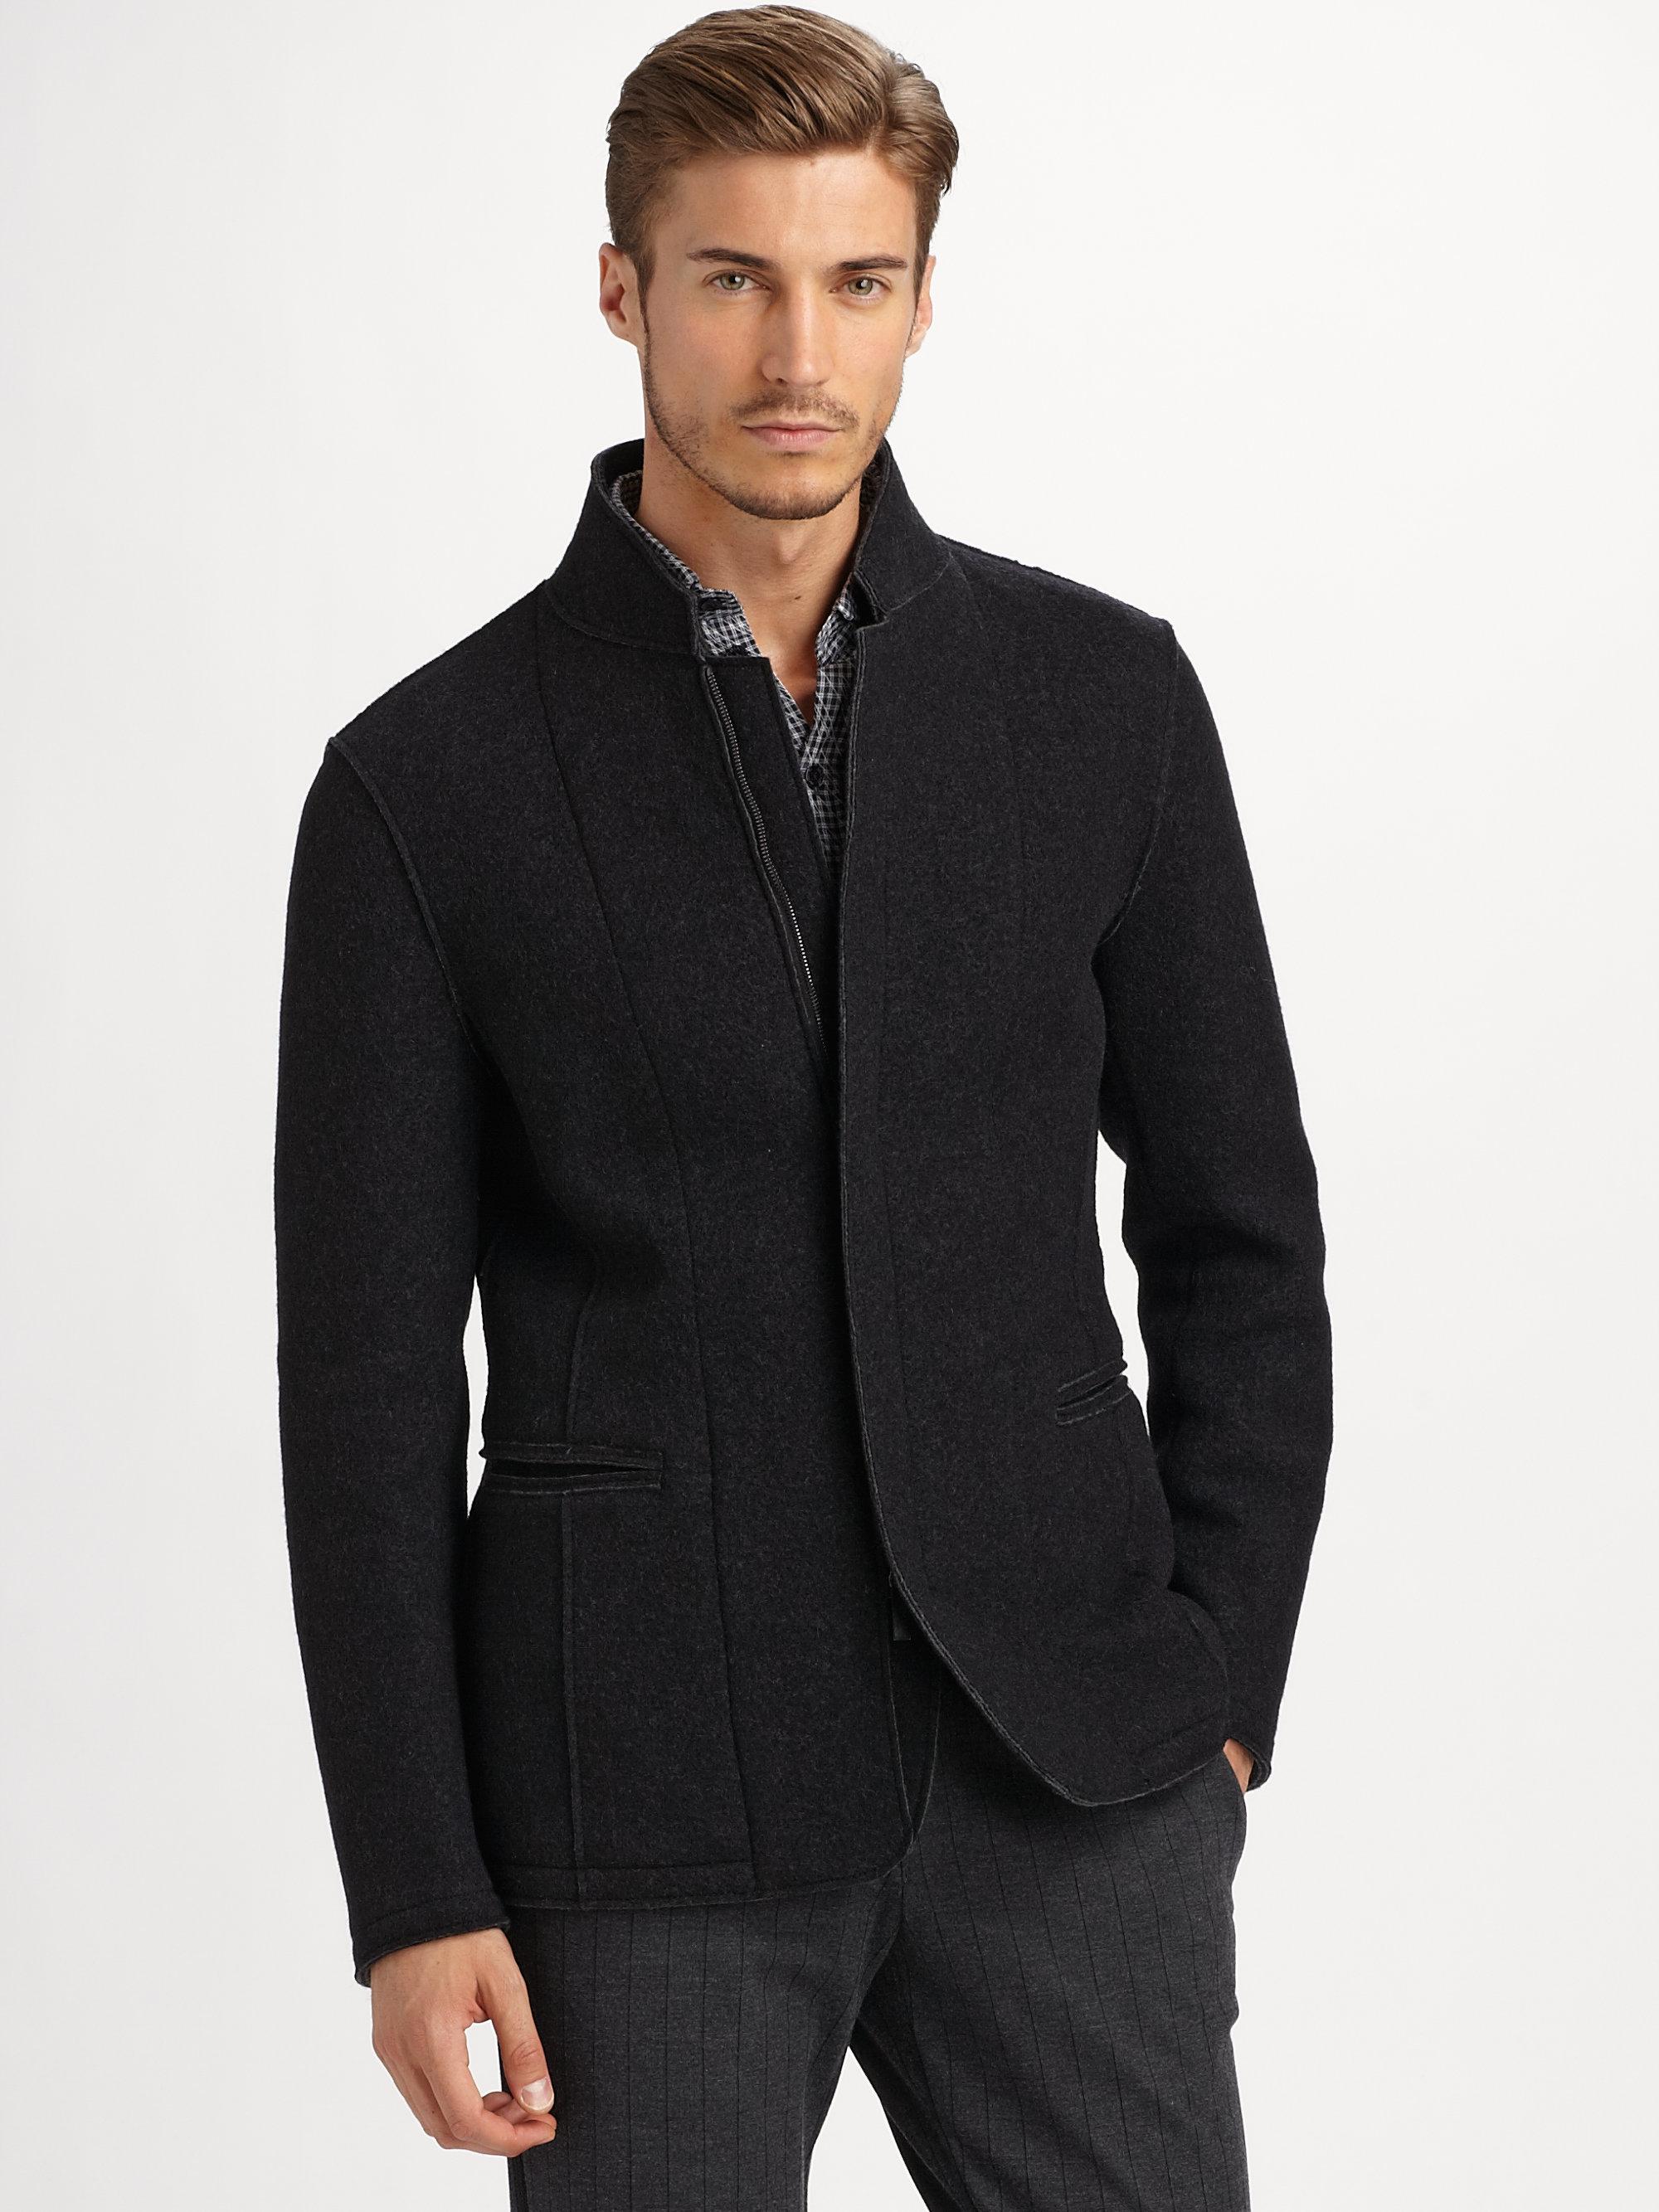 Lyst Armani Boiled Wool Blend Jacket In Black For Men